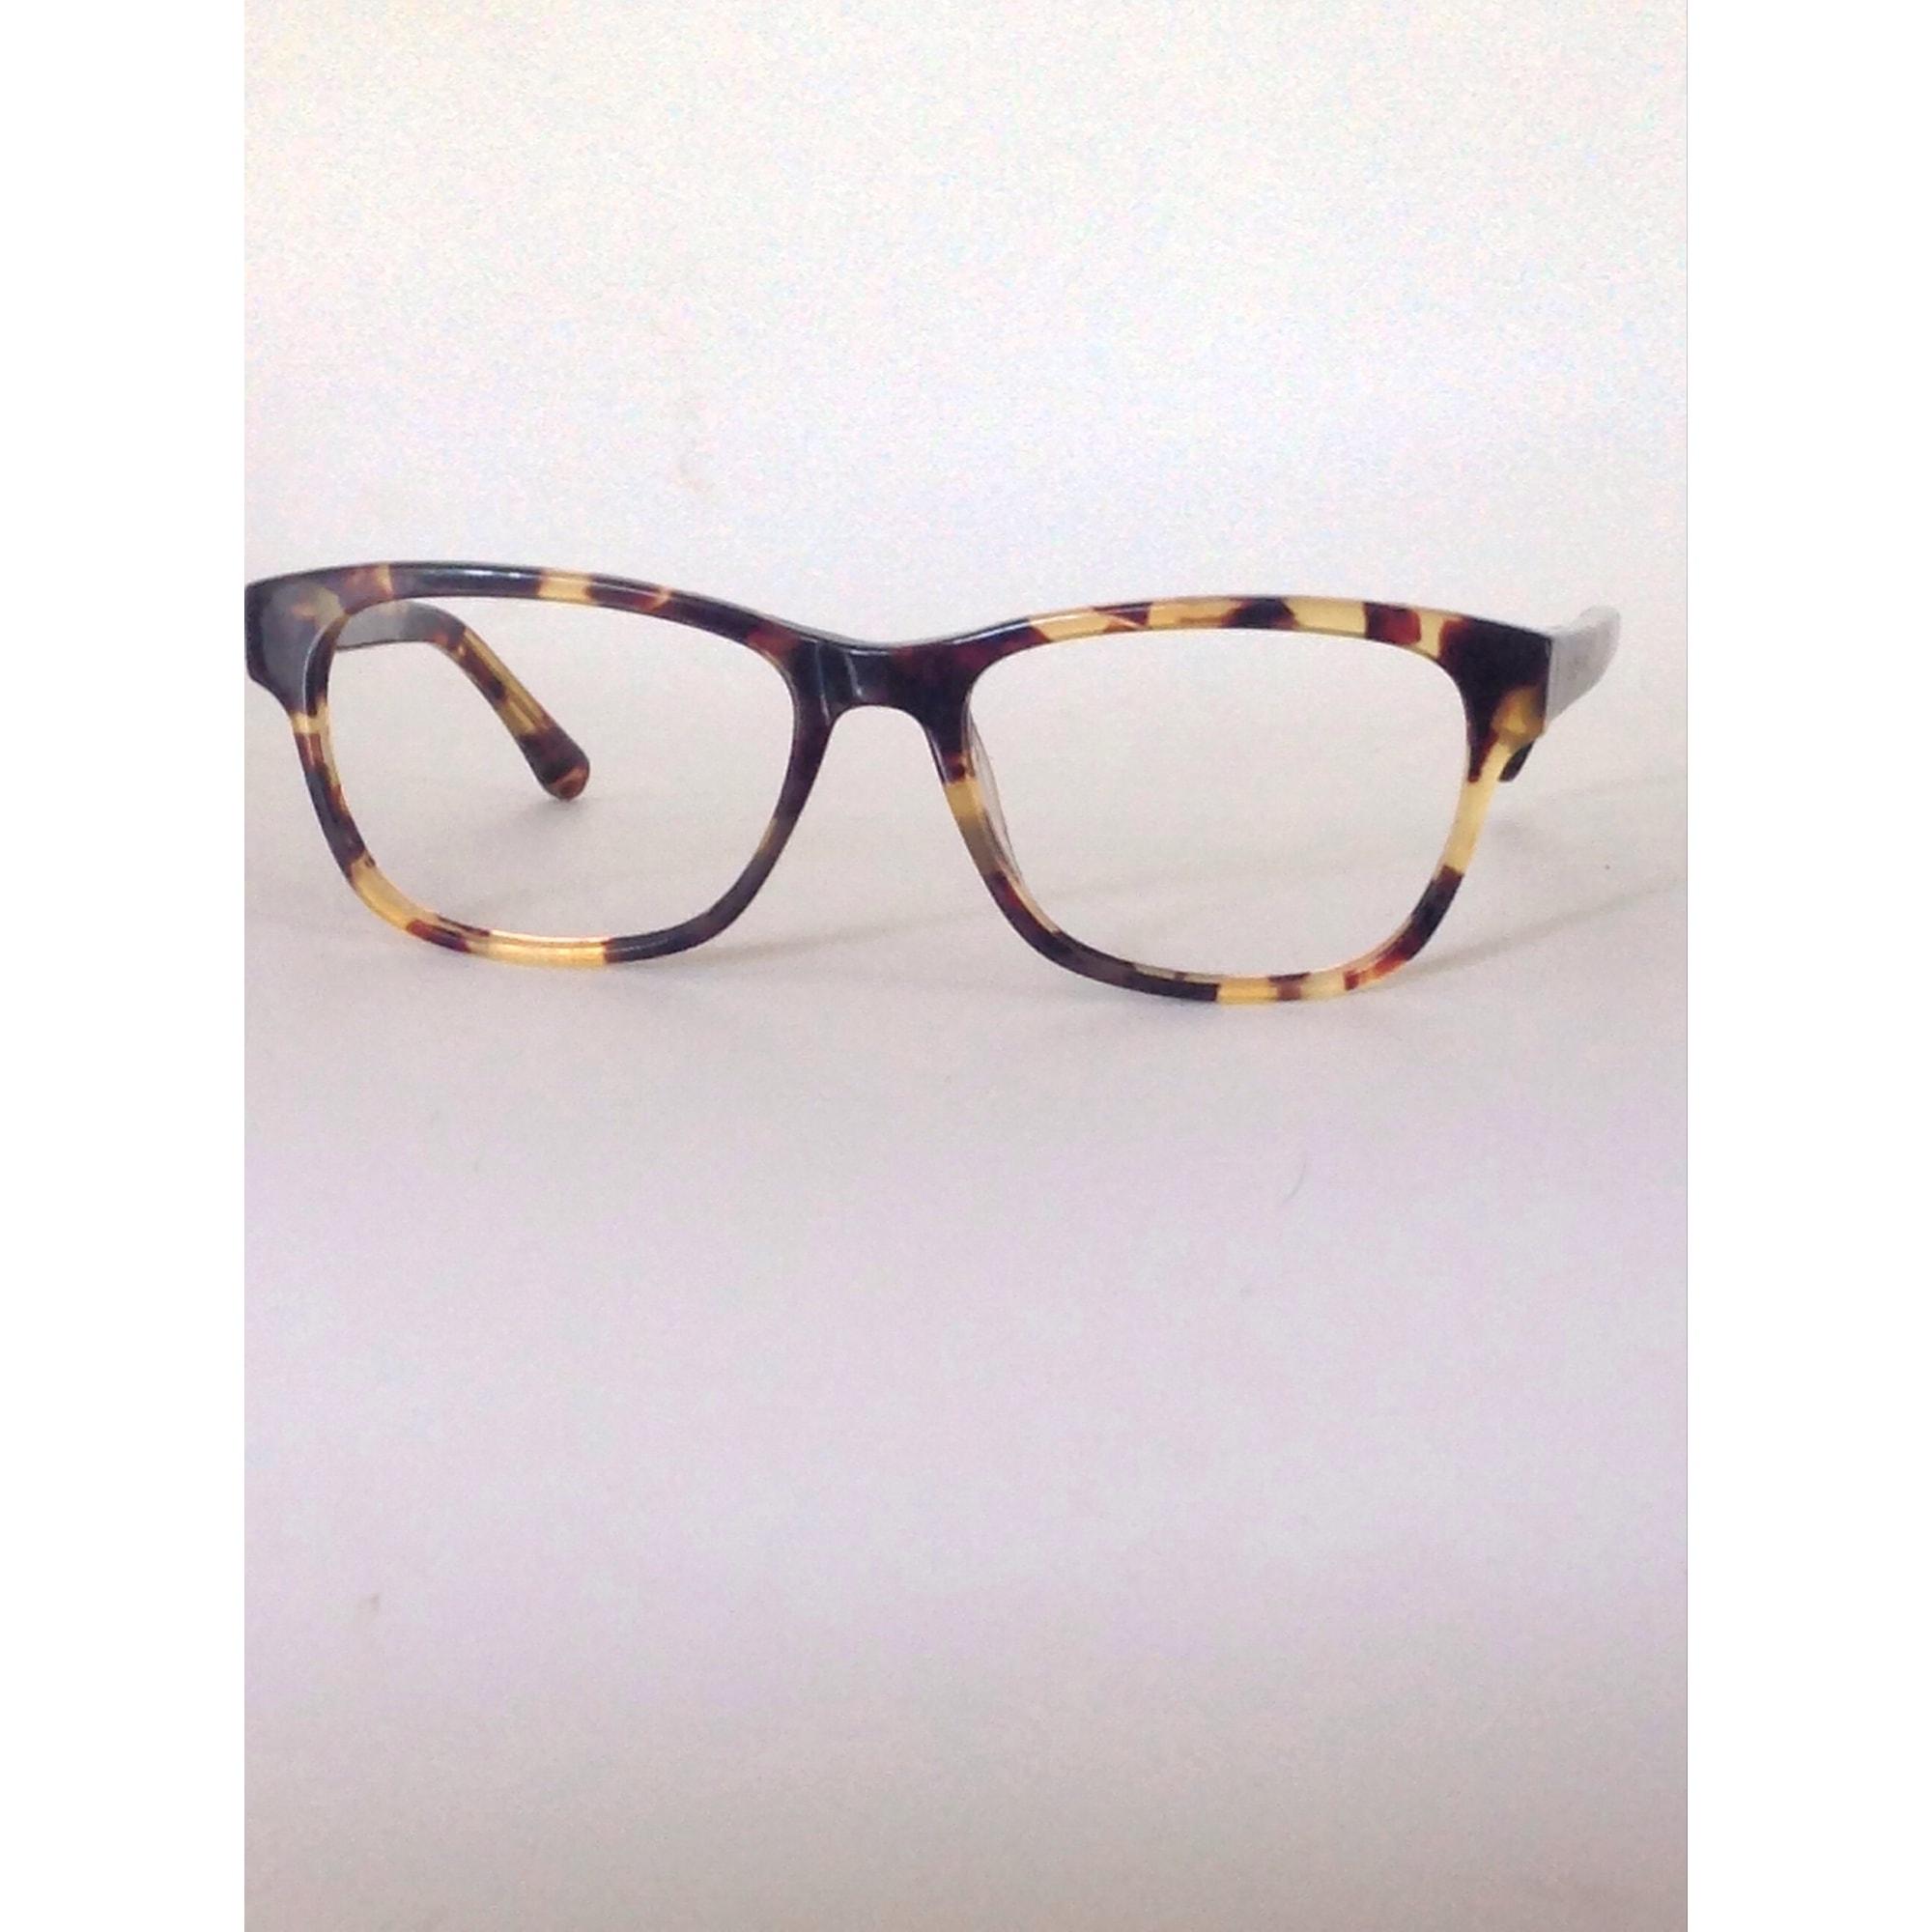 Eyeglass Frames MICHAEL KORS Écaille - 7592427